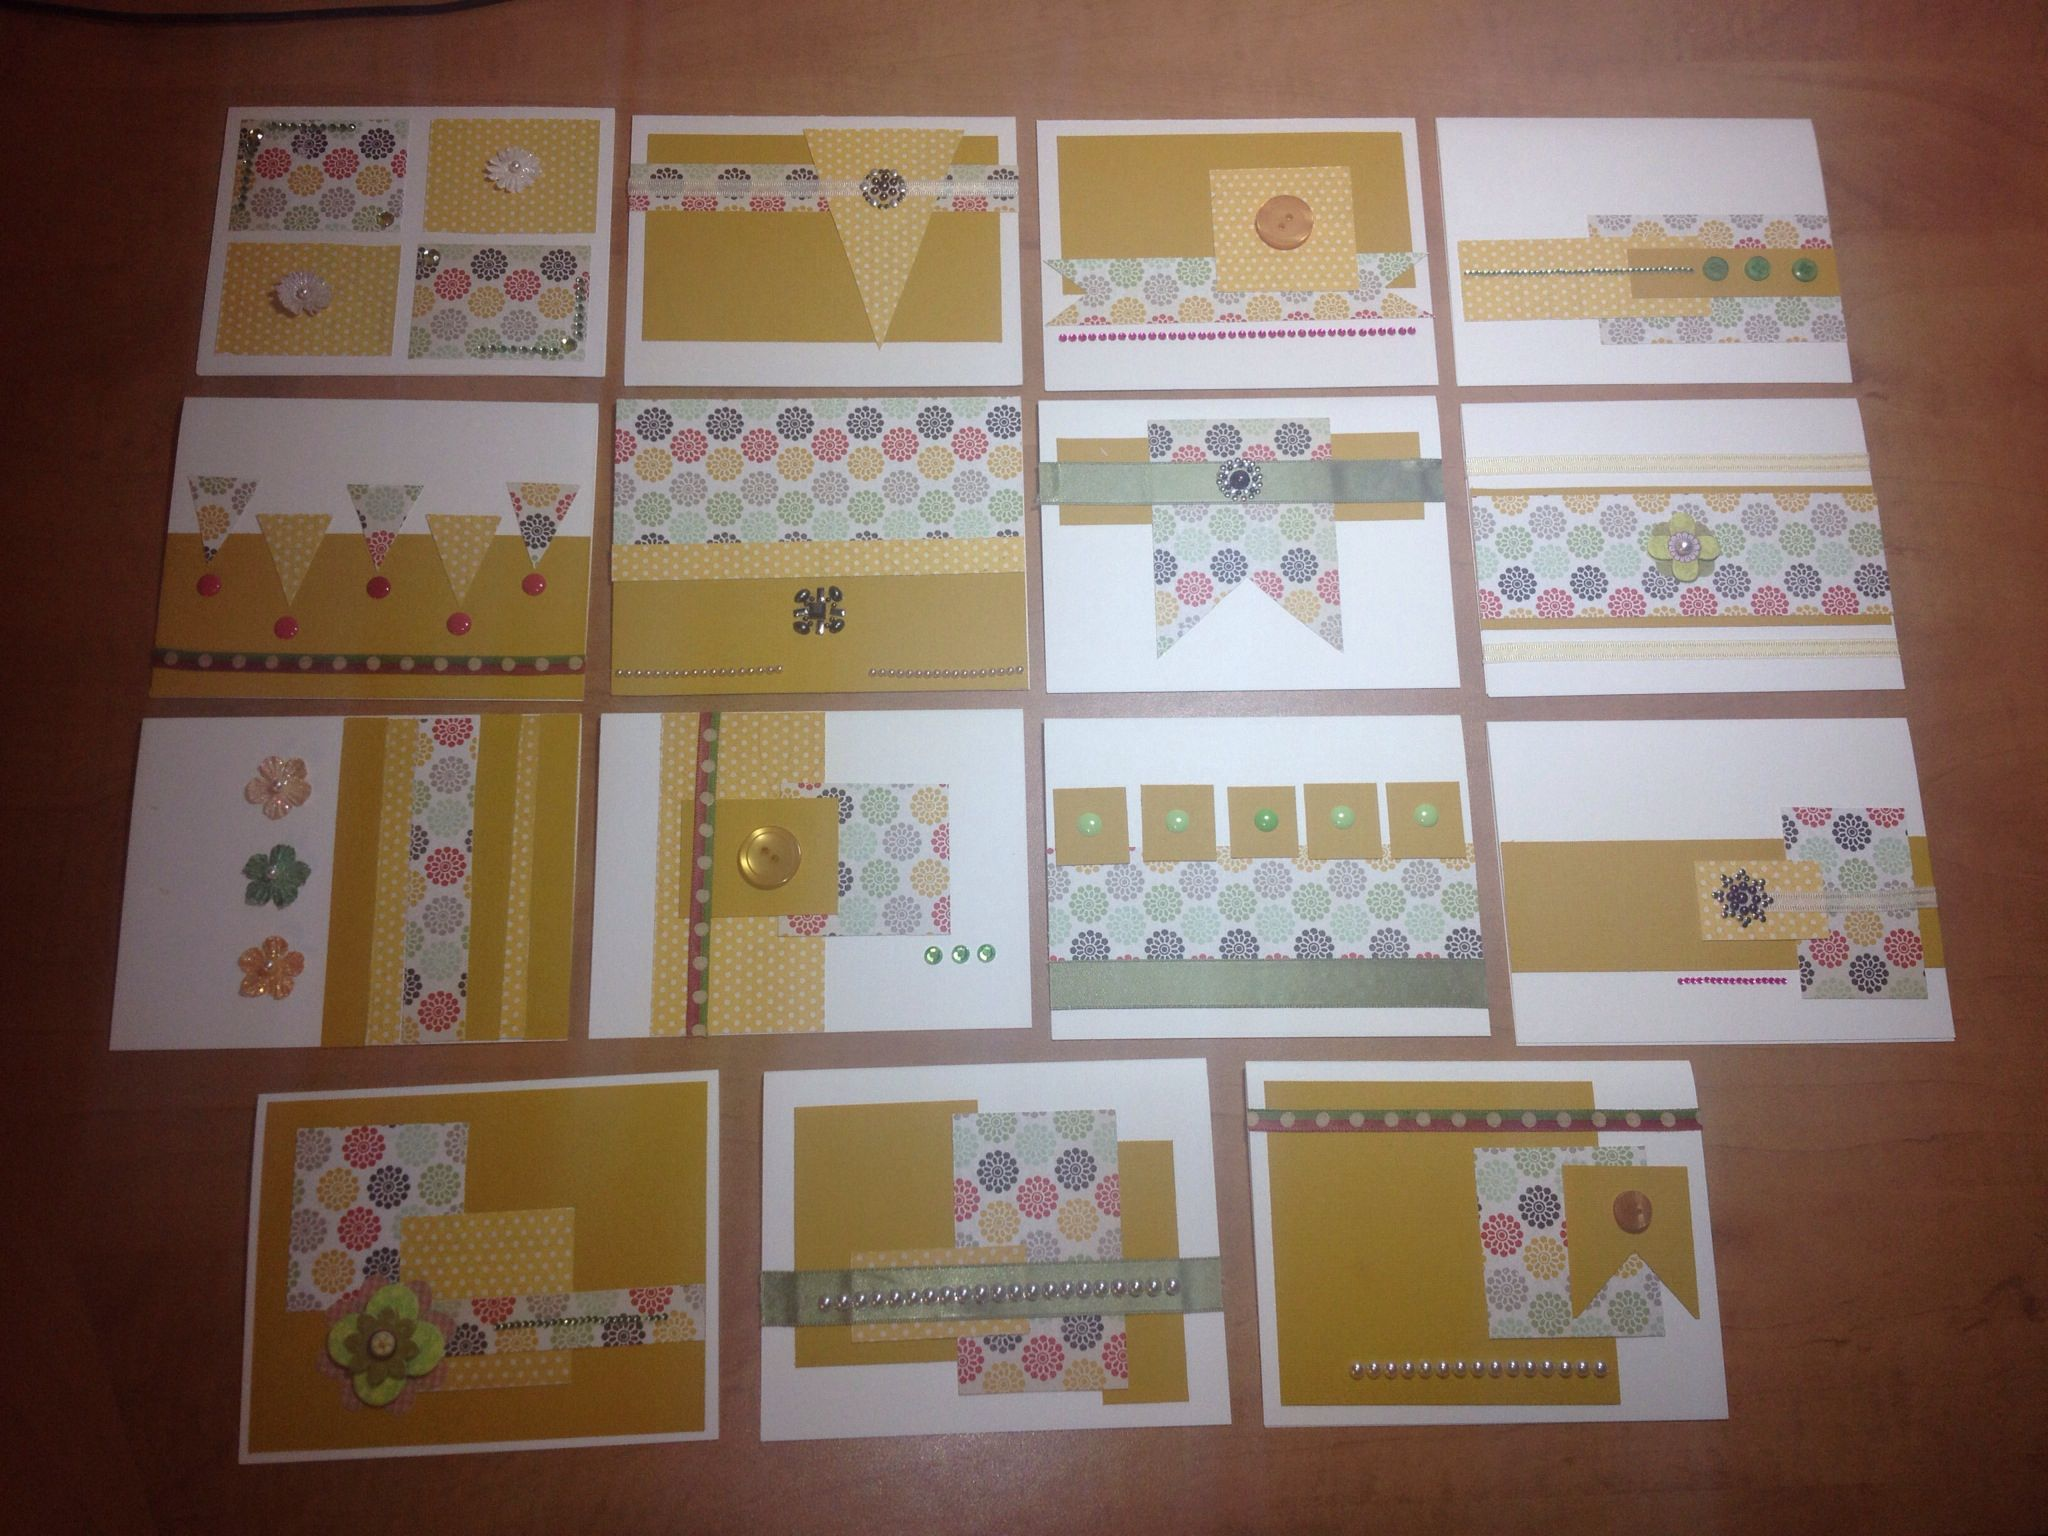 One sheet wonder cards | Crafts | Pinterest | One sheet ... - photo#34